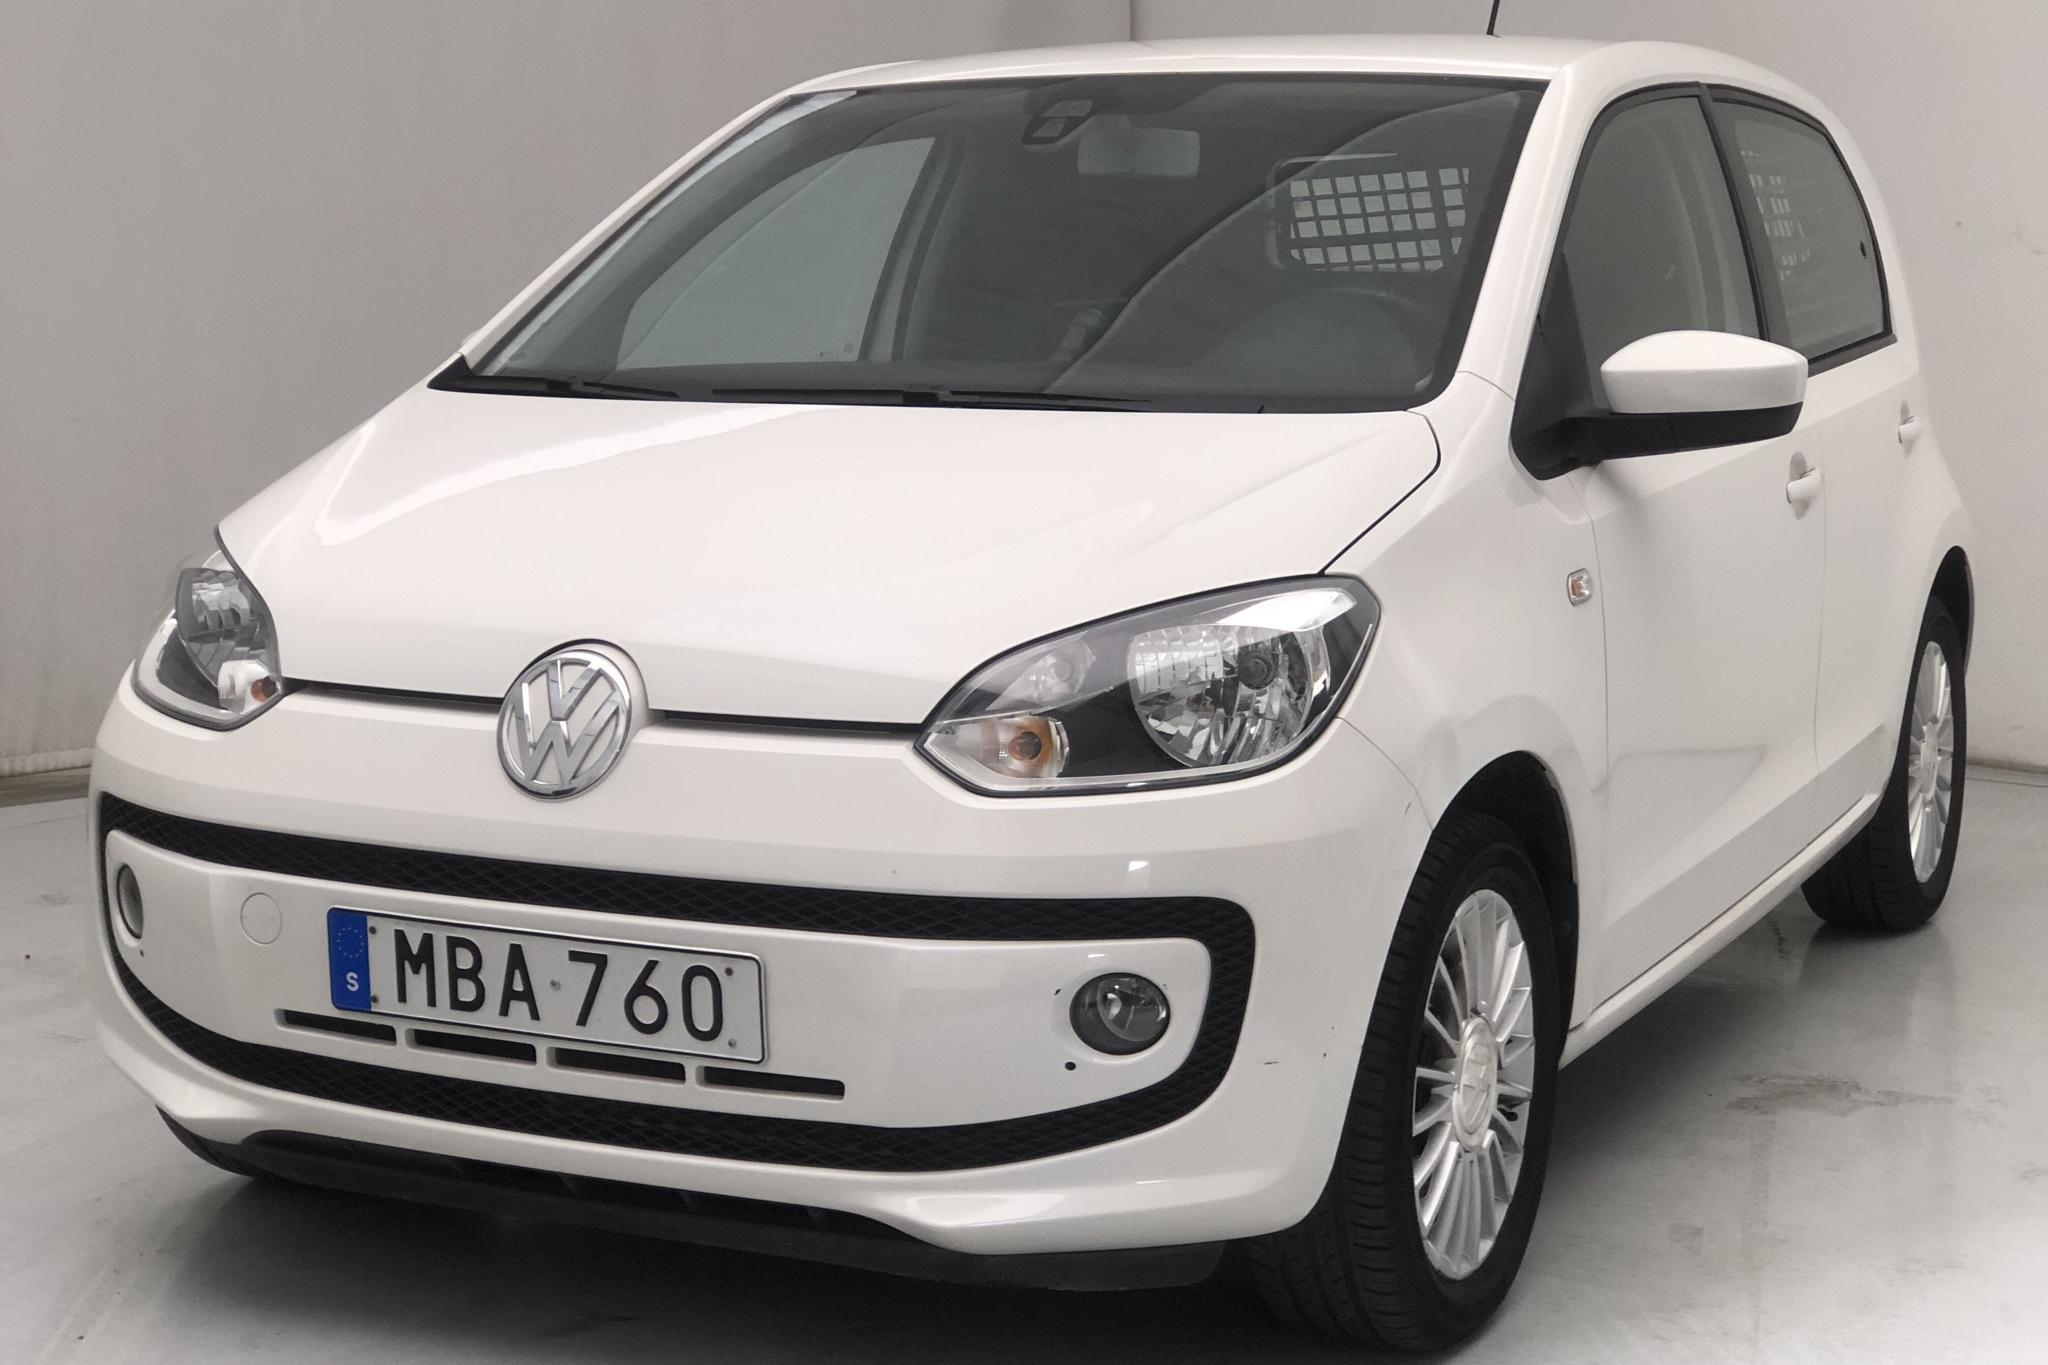 VW up! 1.0 5dr (75hk) - 34 900 km - Manual - white - 2016